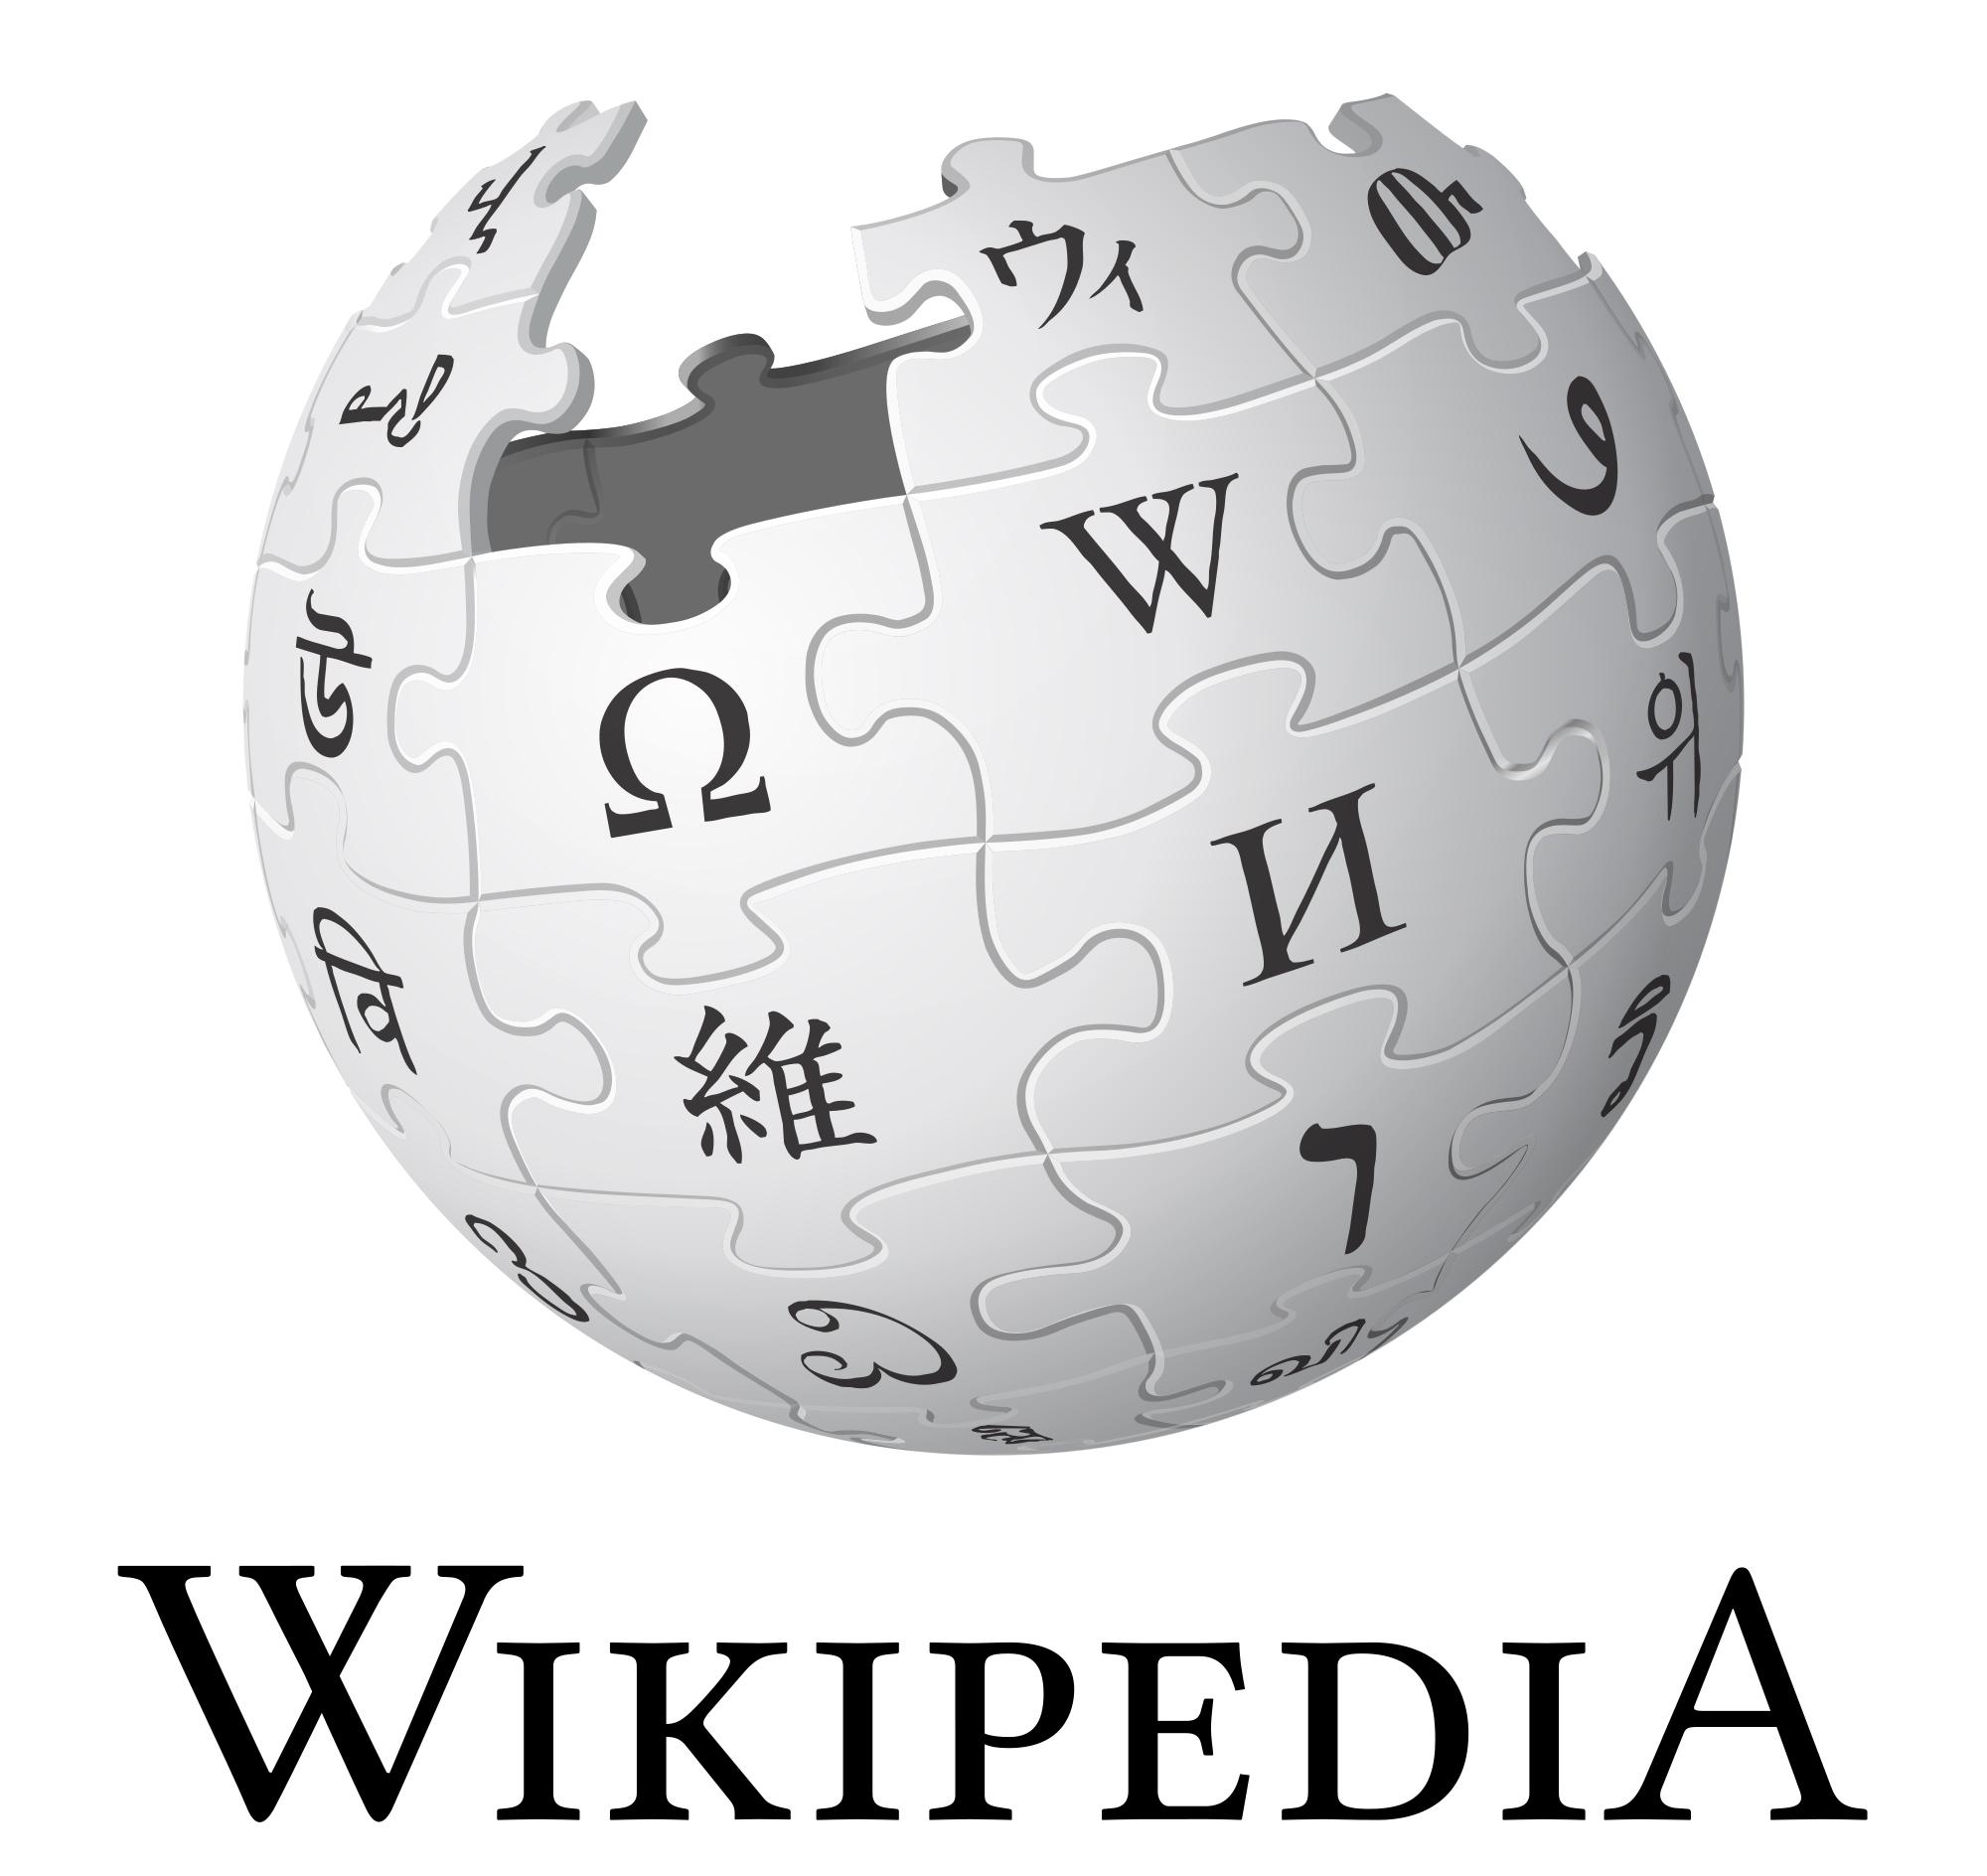 Wikipedia logo : histoire, signification et évolution, symbole